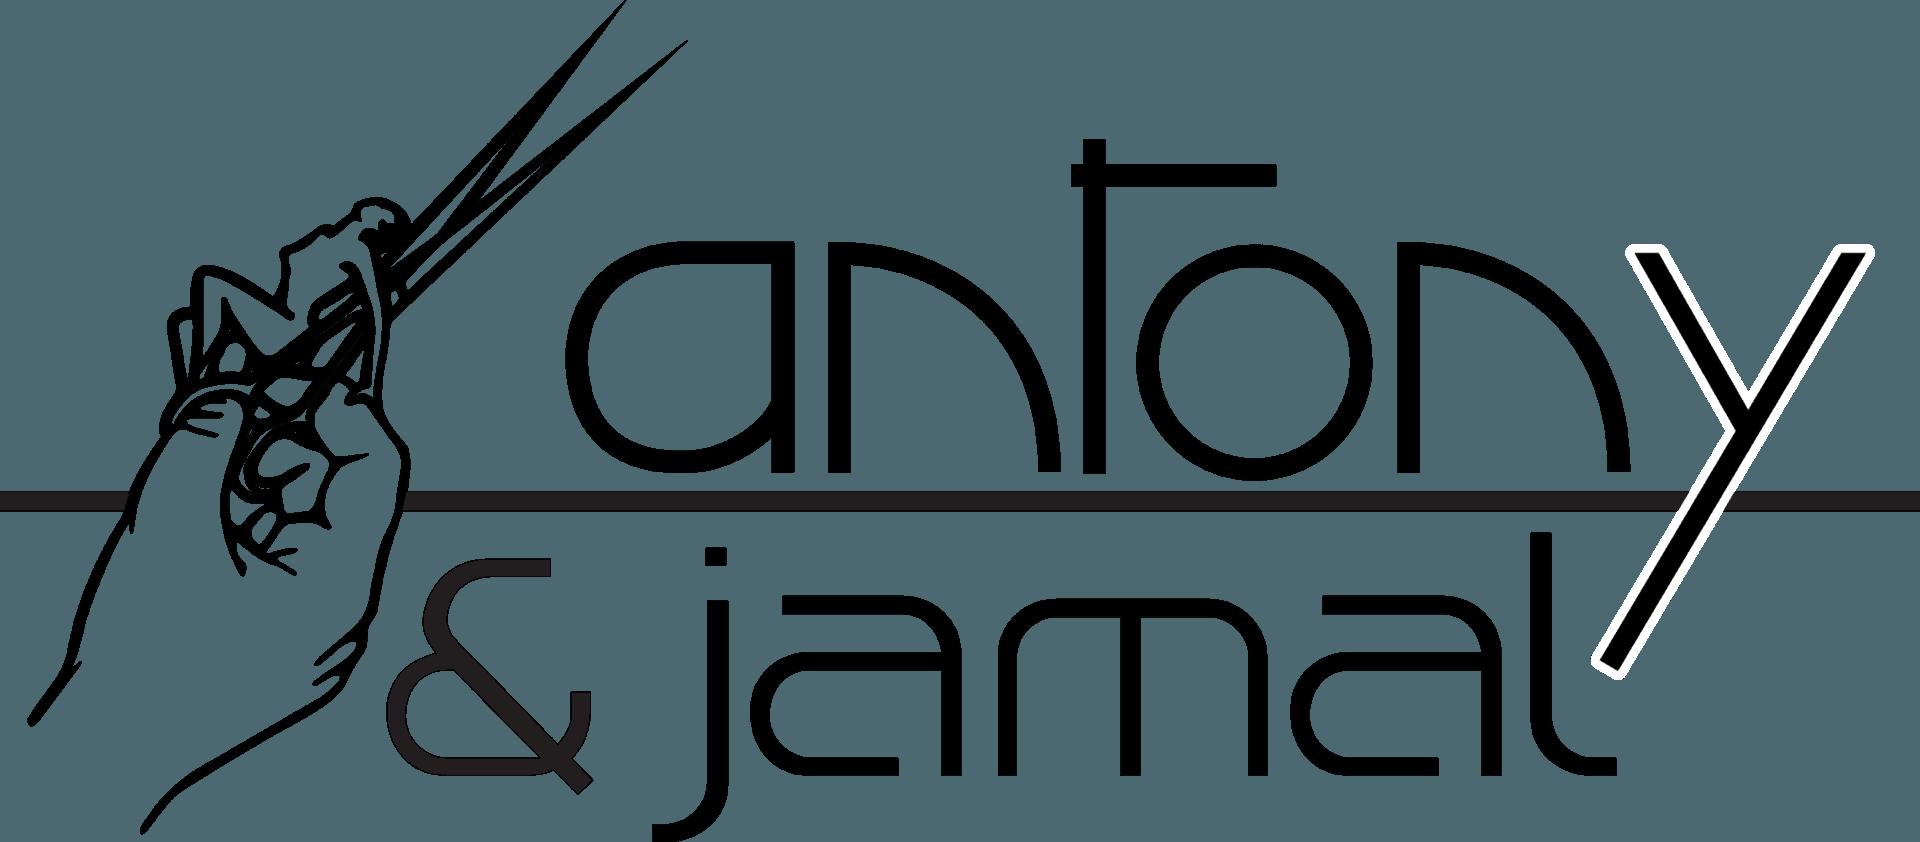 ANTONY & JAMAL - LOGO